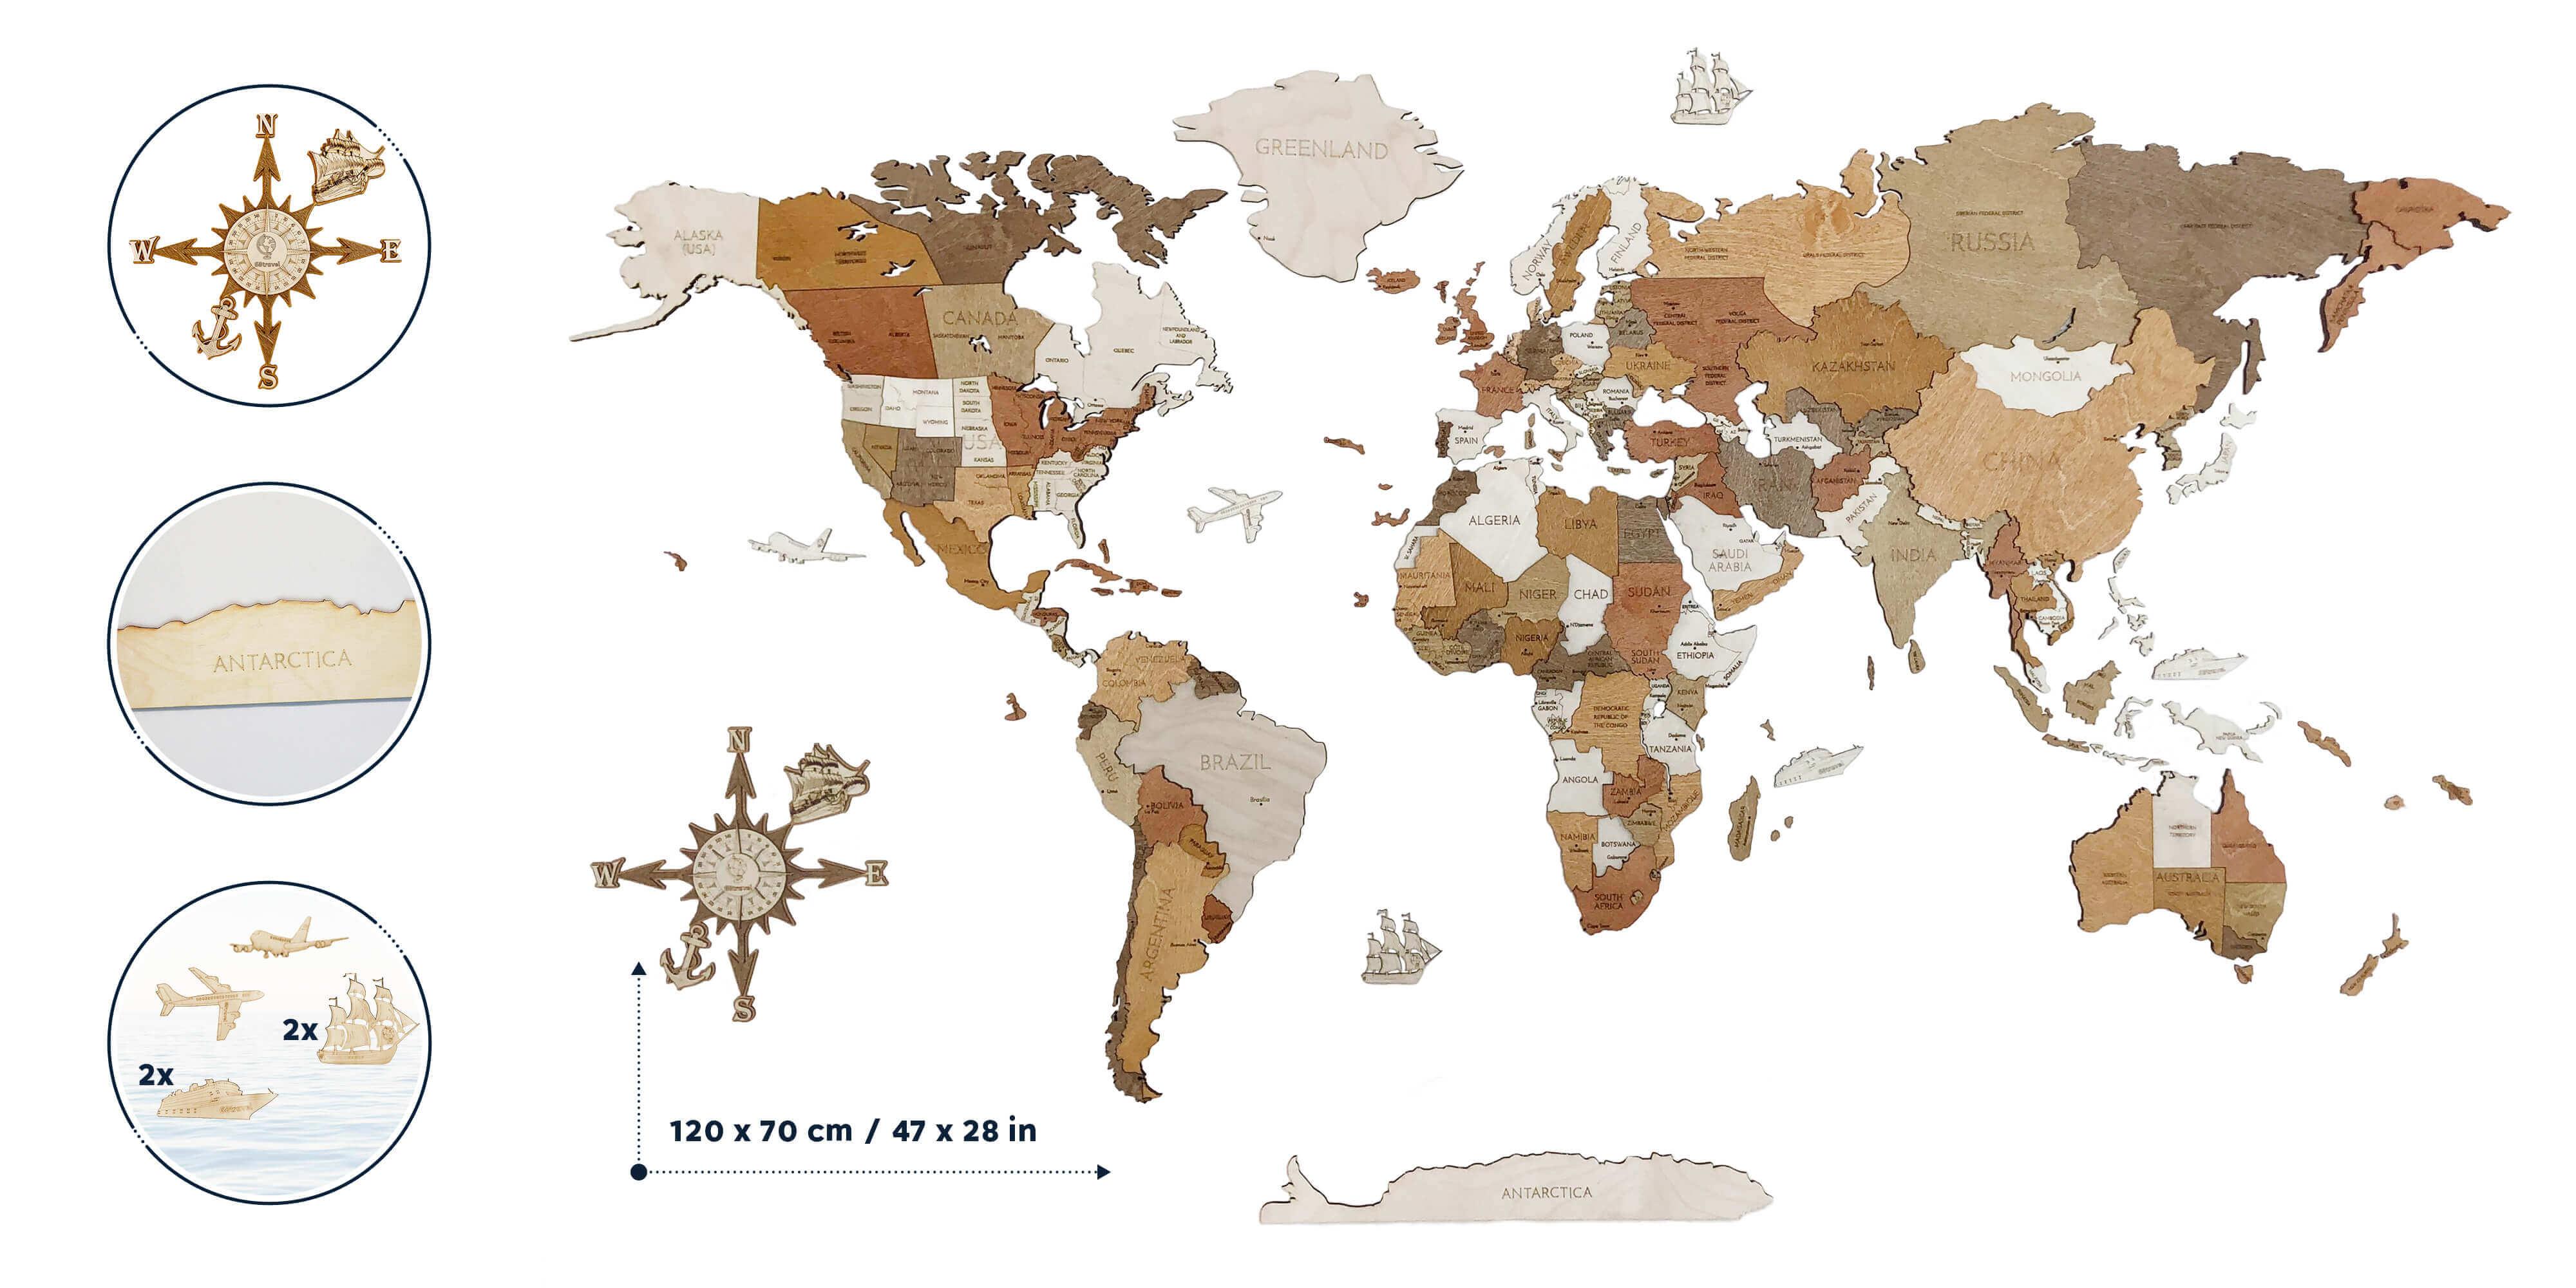 Drevená mapa sveta L - Antarctica (rozmer 120x70 cm)